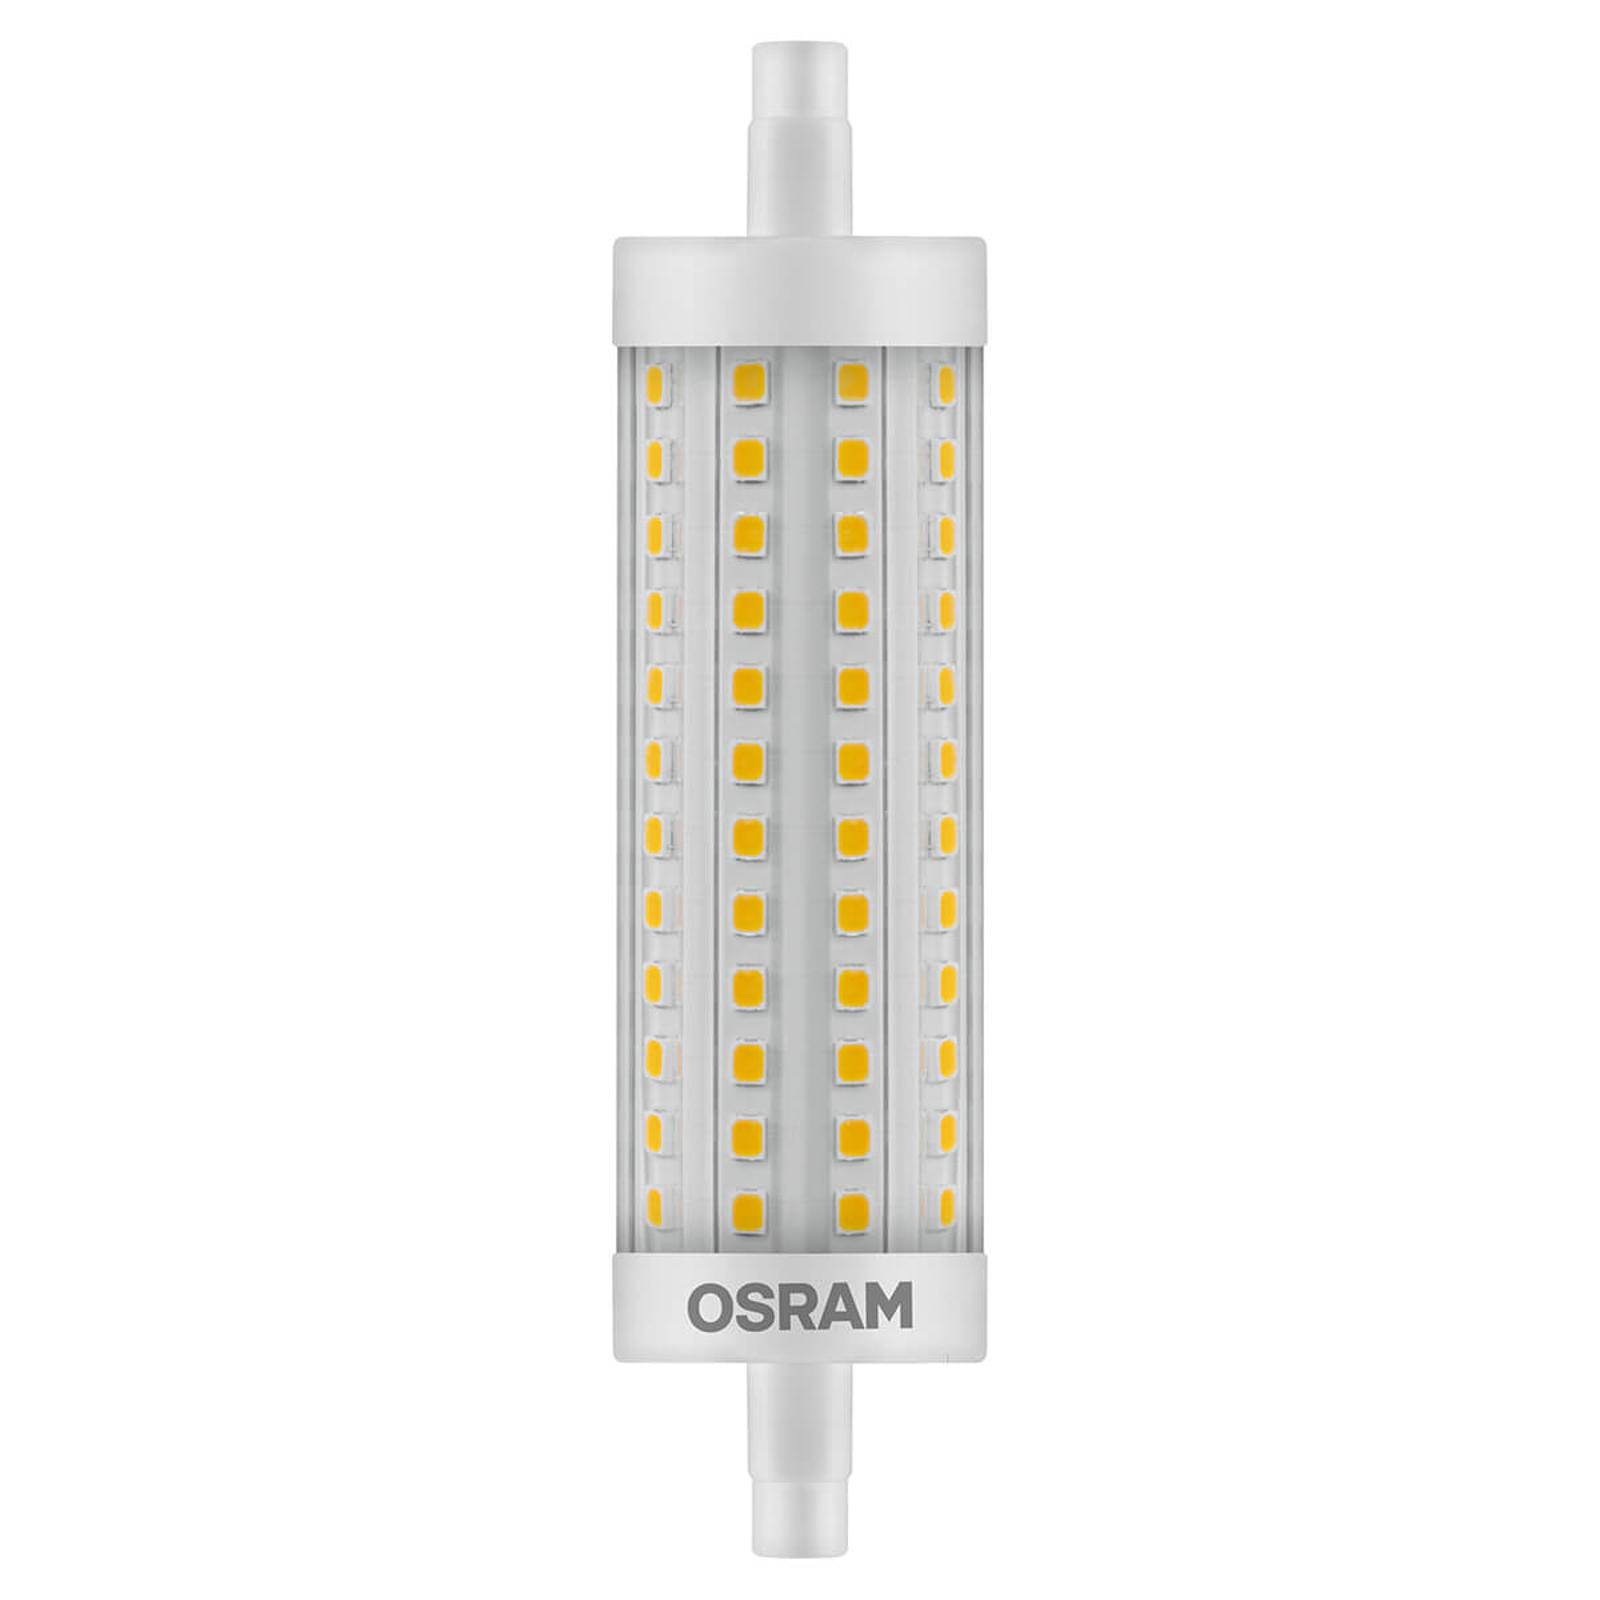 OSRAM LED-stav R7s 15W 11,8 cm 827 dimbar